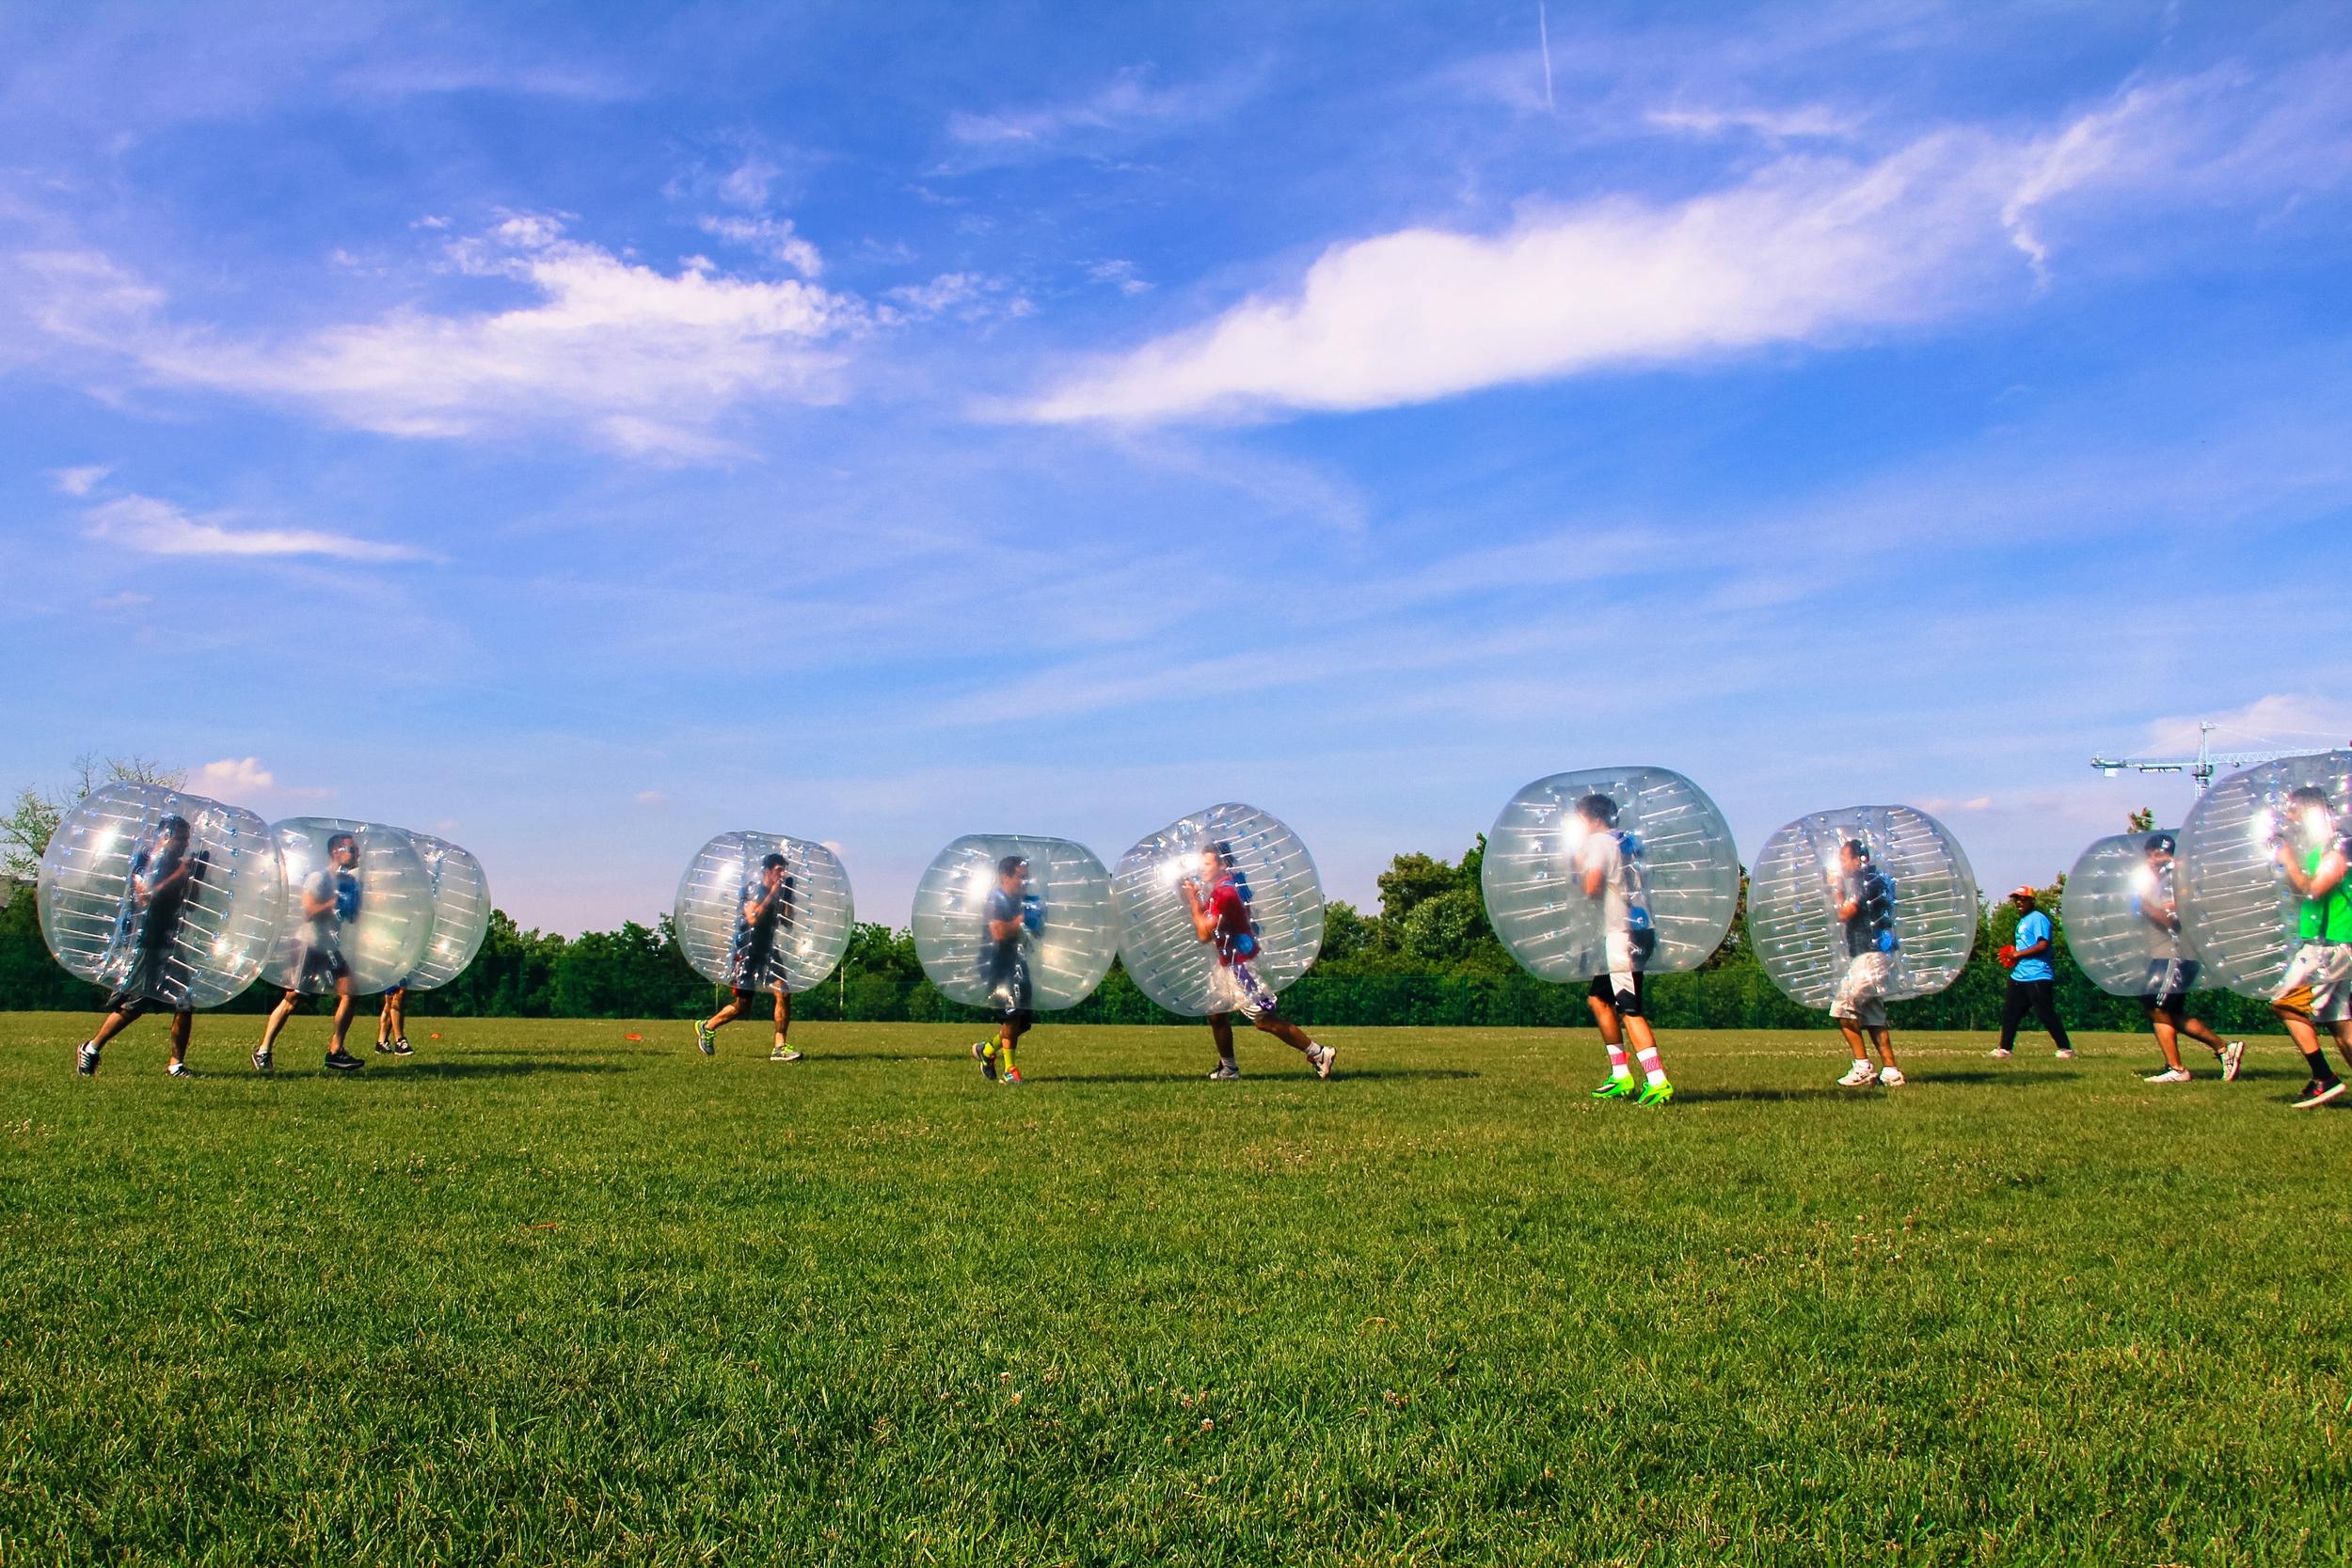 Capital One Bubble Soccer Rental